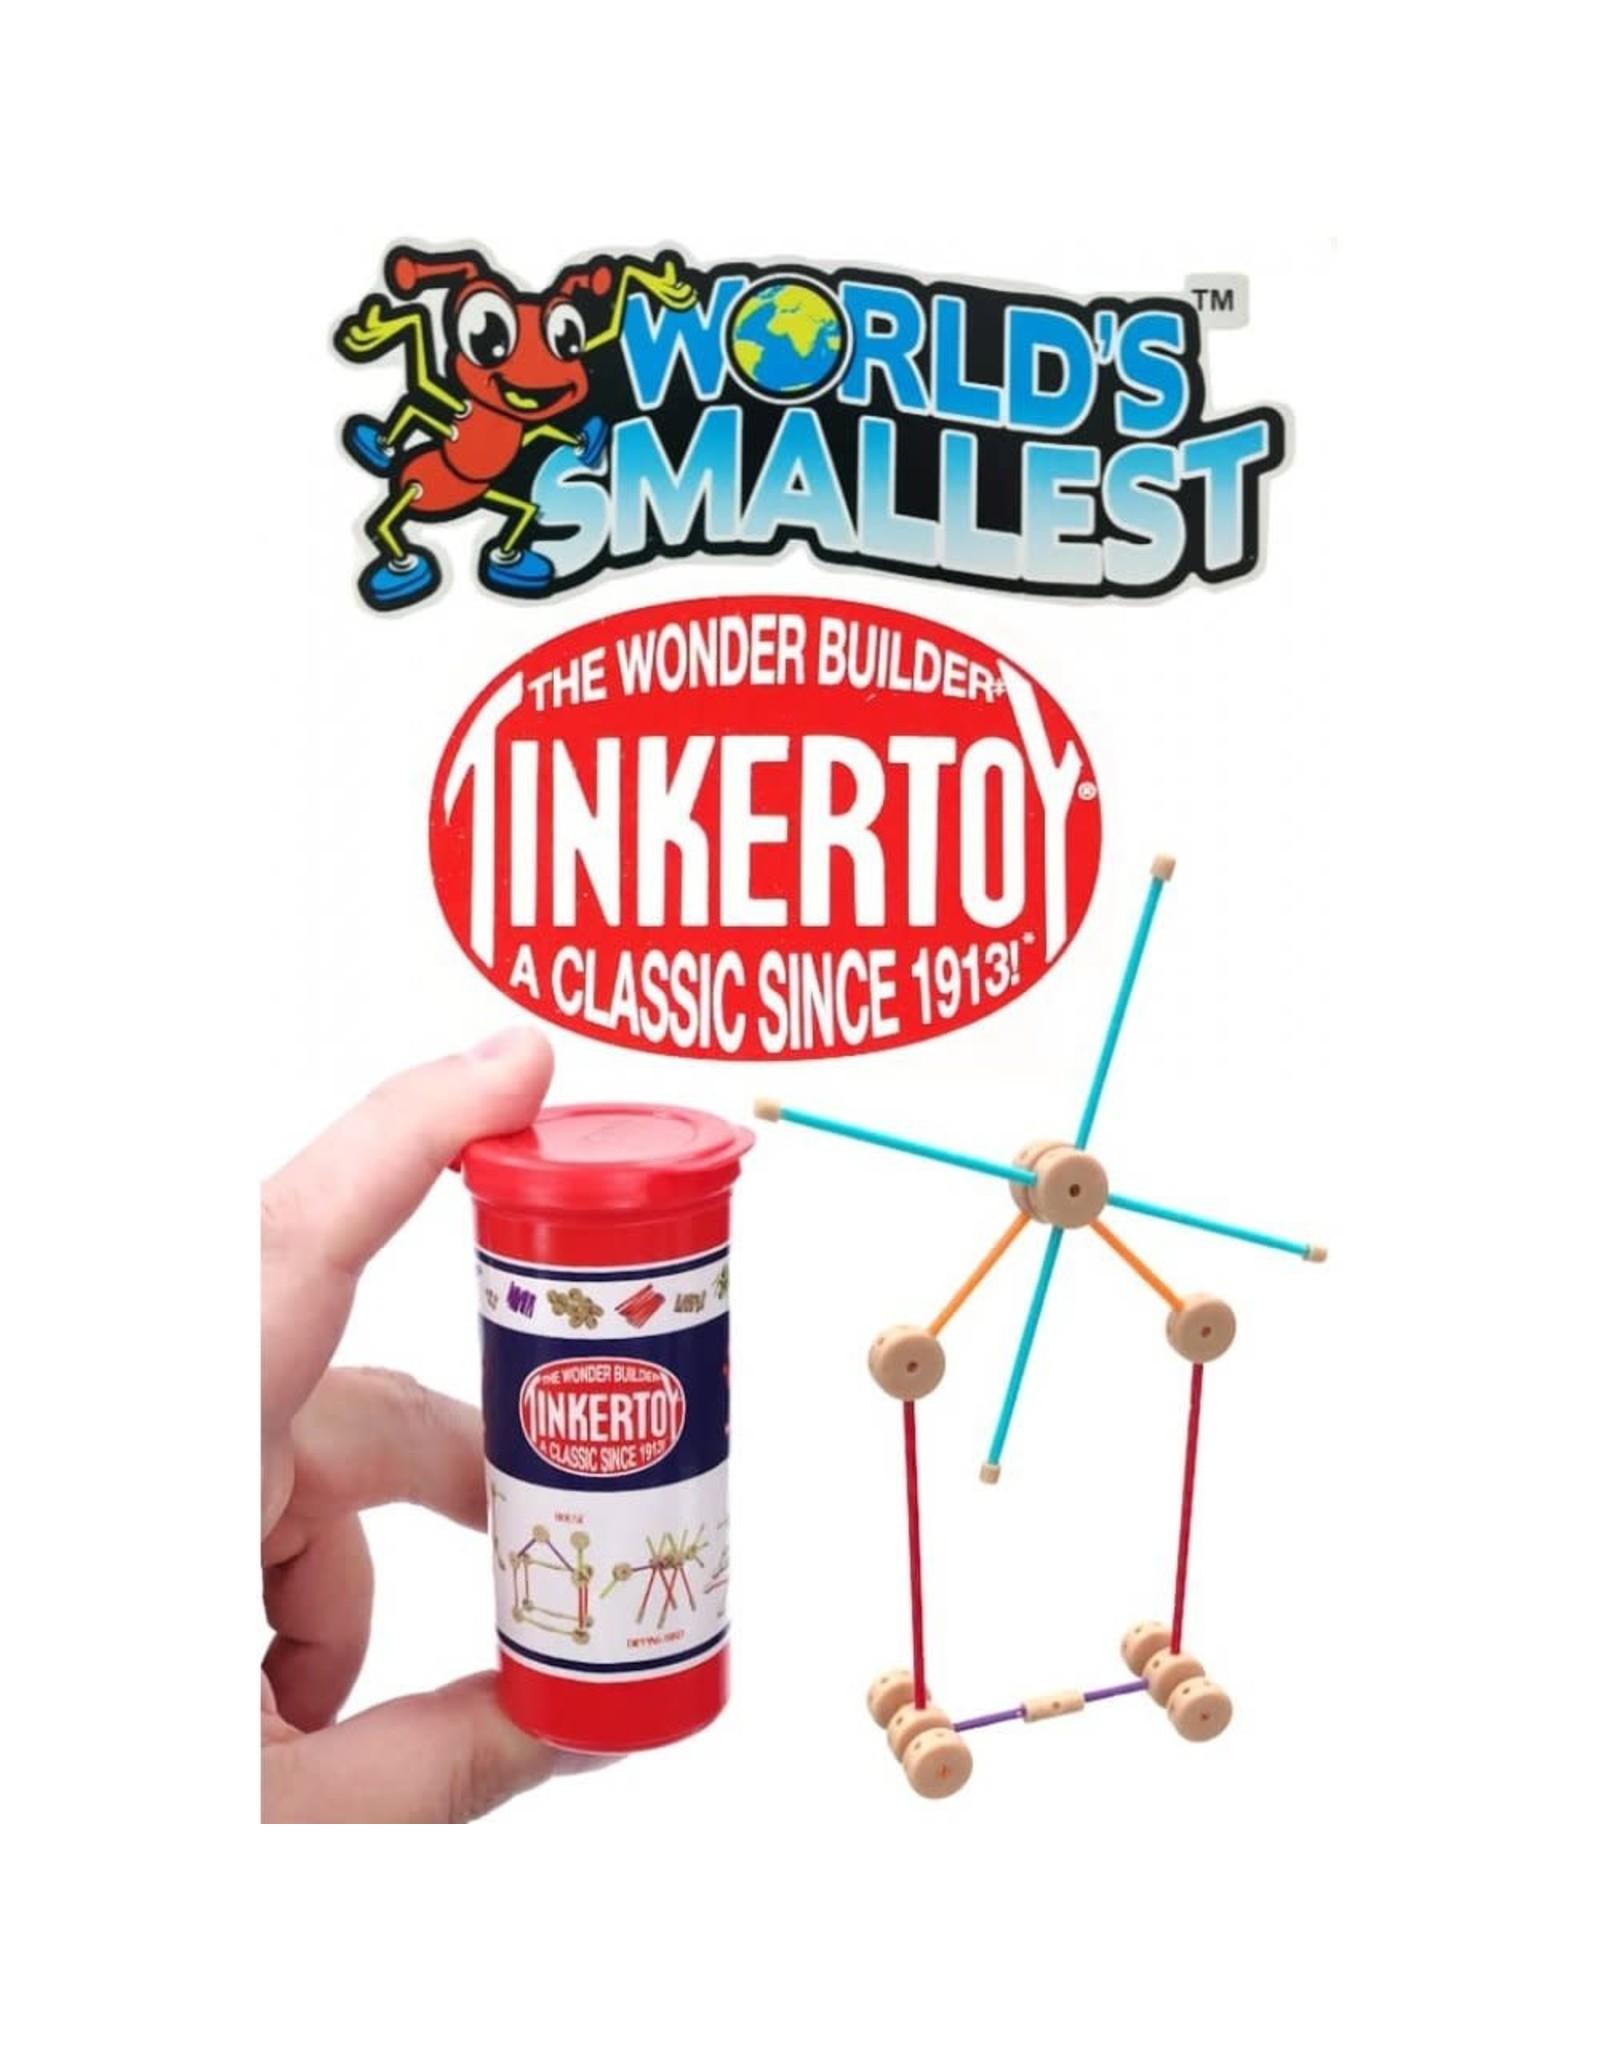 SUPER IMPULSE WORLD'S SMALLEST TINKER TOY